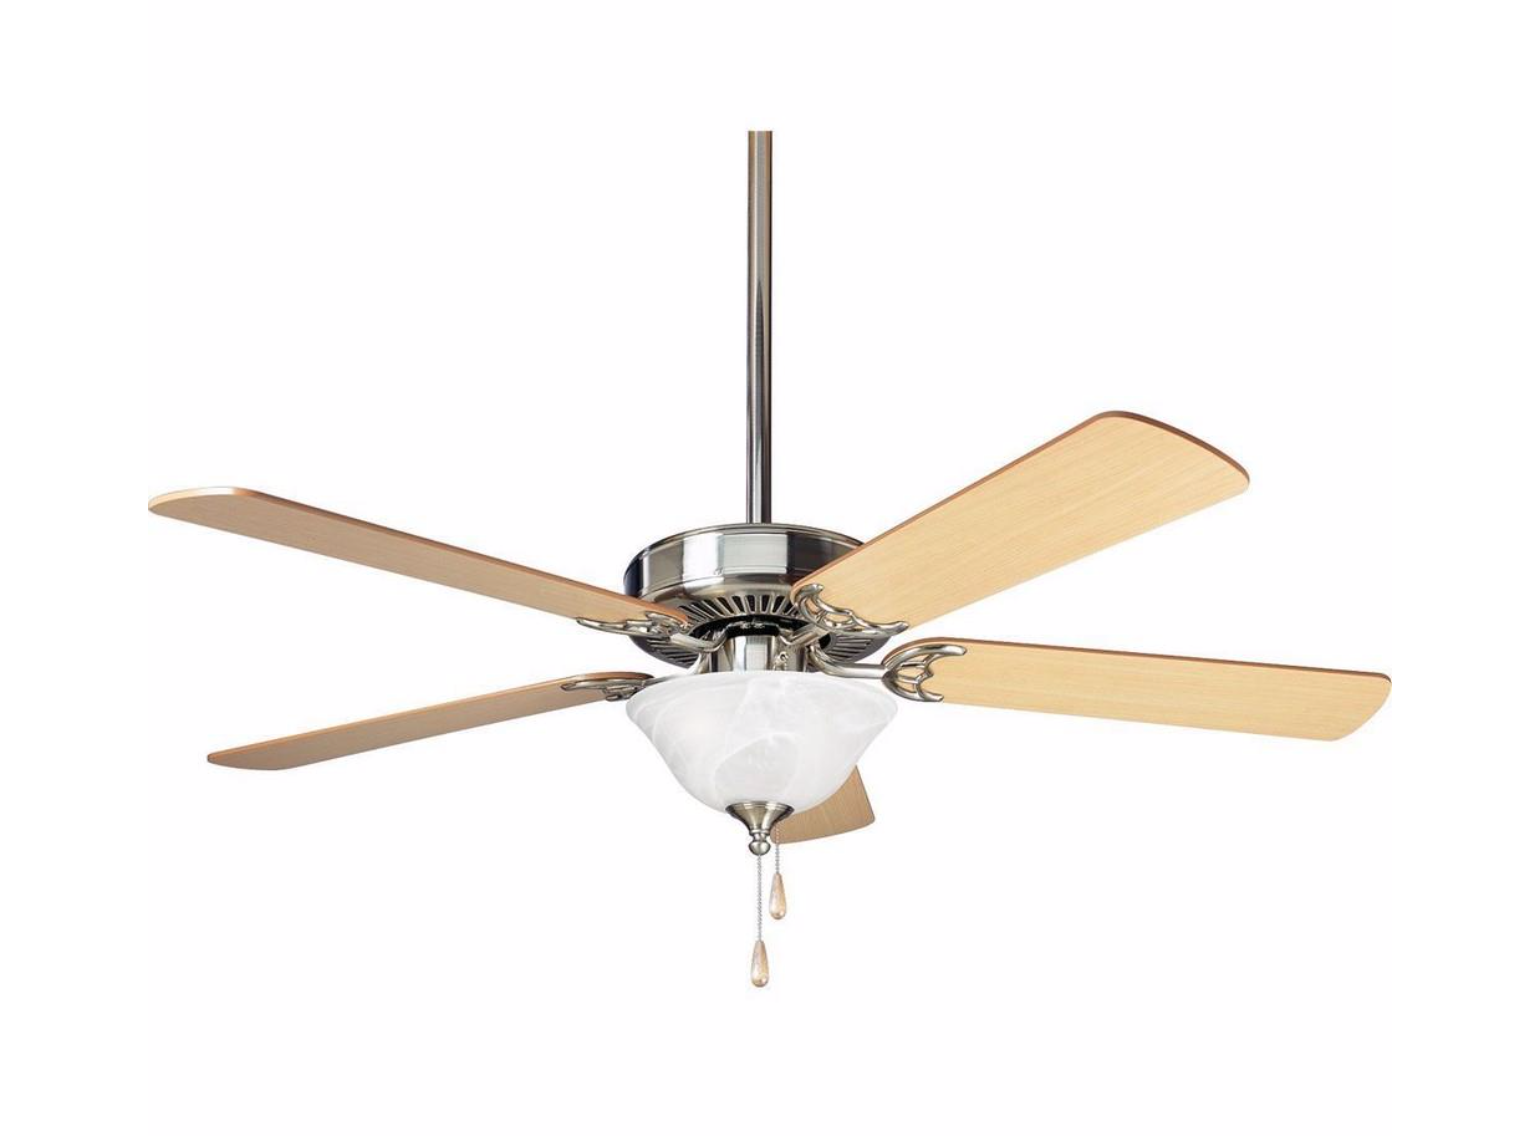 Air Pro 52 Ceiling Fan Ceiling Fan 52 Ceiling Fan Fan